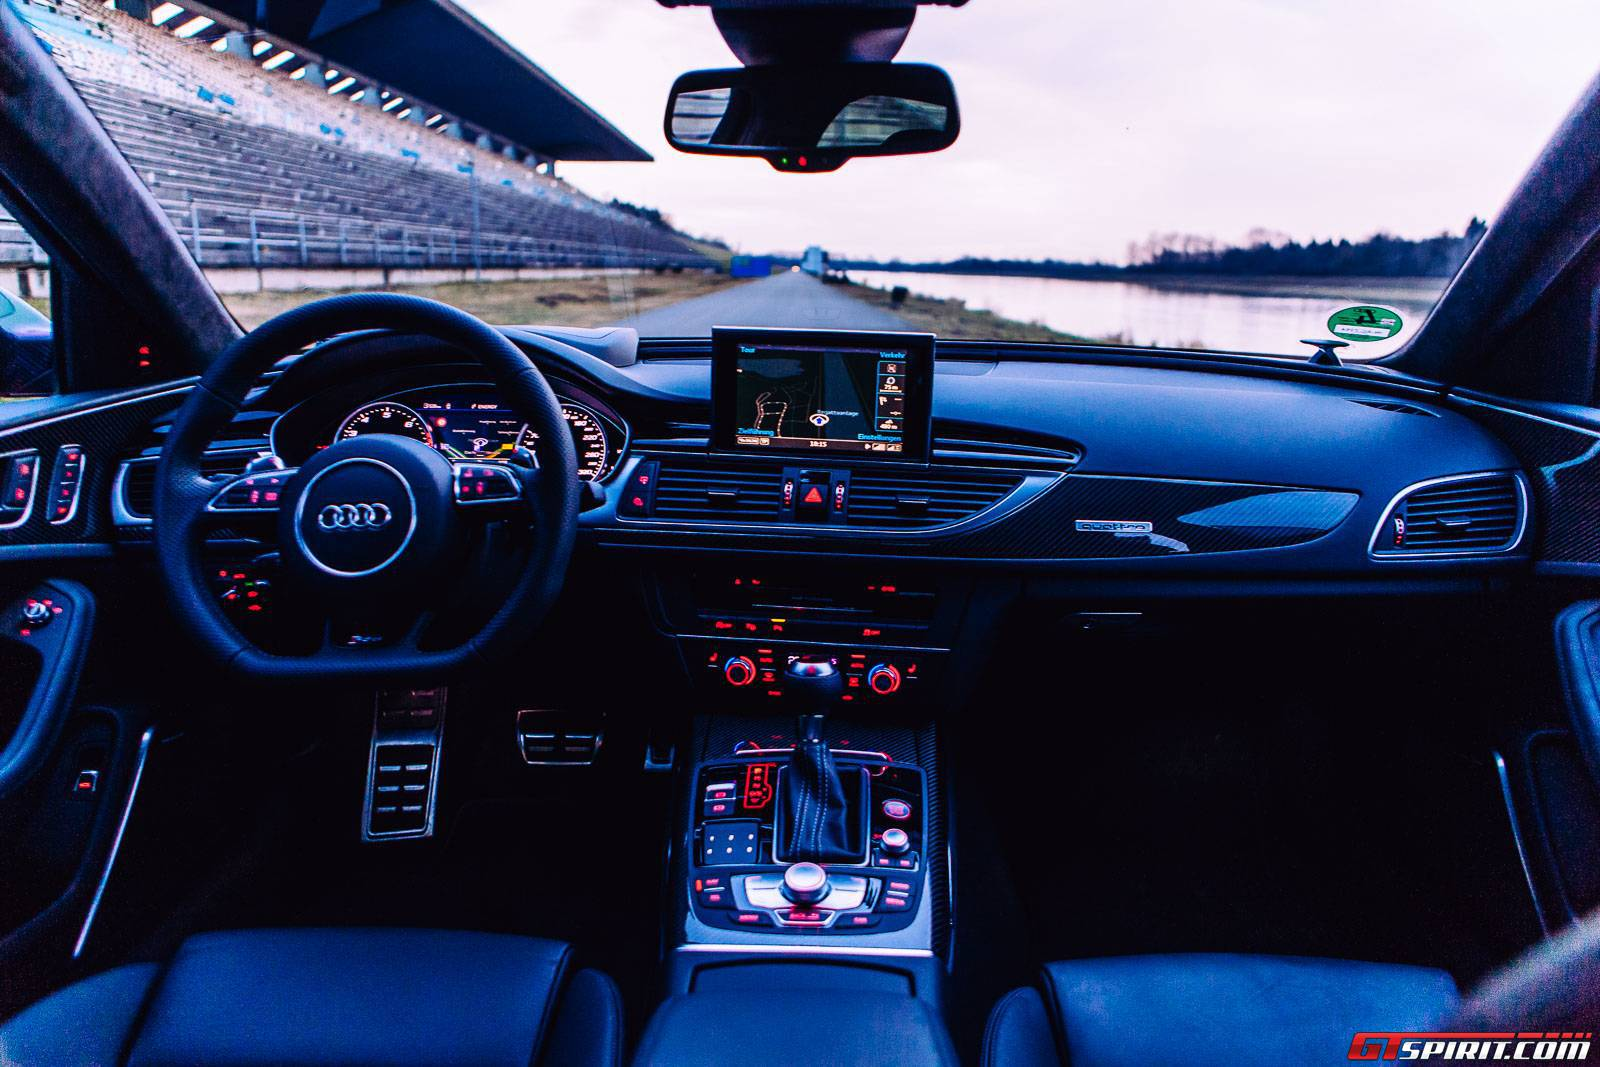 Audi Rs6 Inside >> 2016 Audi RS6 Avant Review - GTspirit